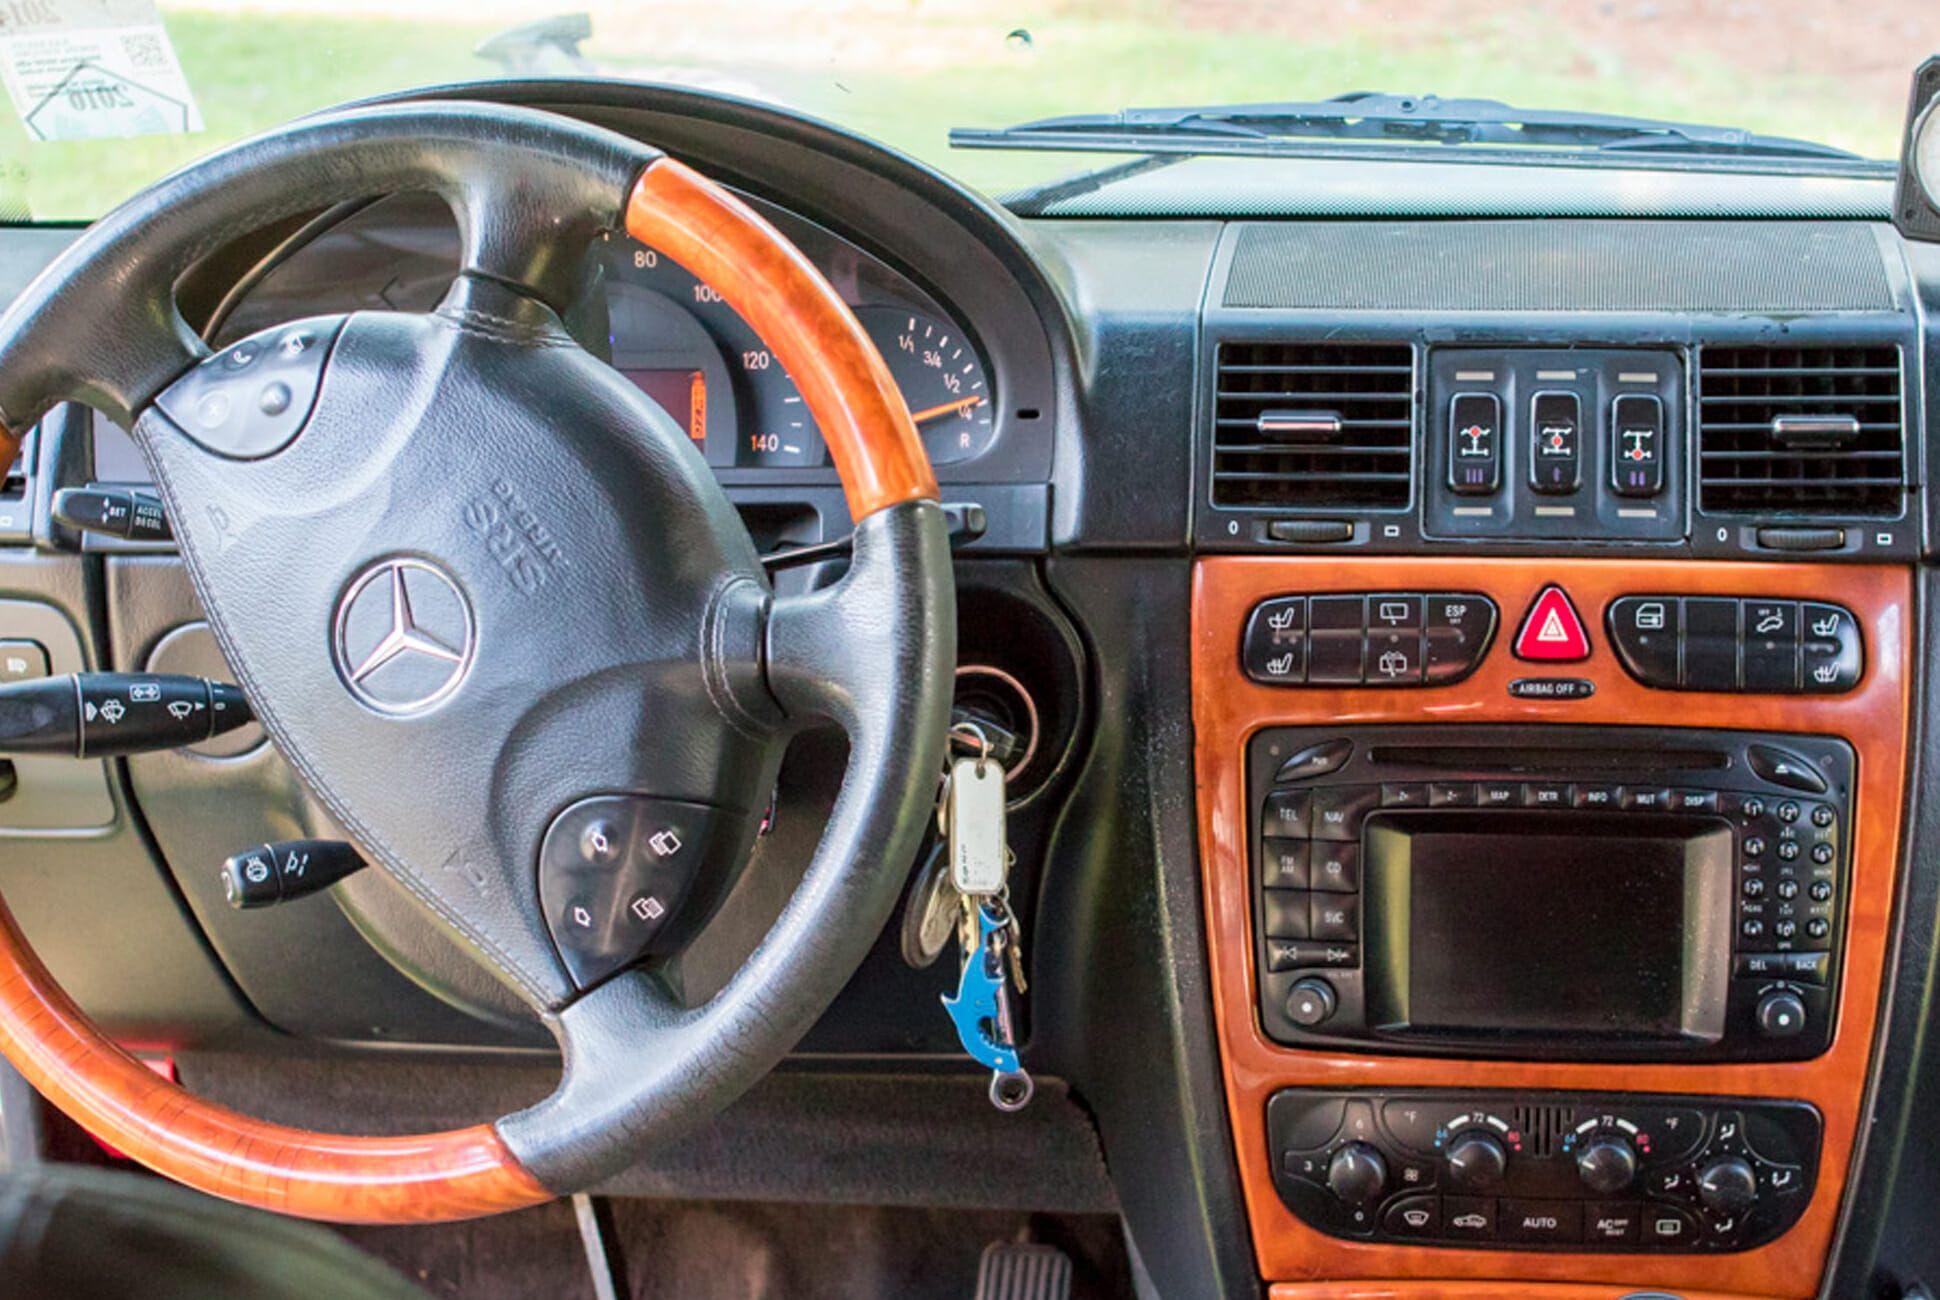 2003-Mercedes-Benz-G500-gear-patrol-slide-05